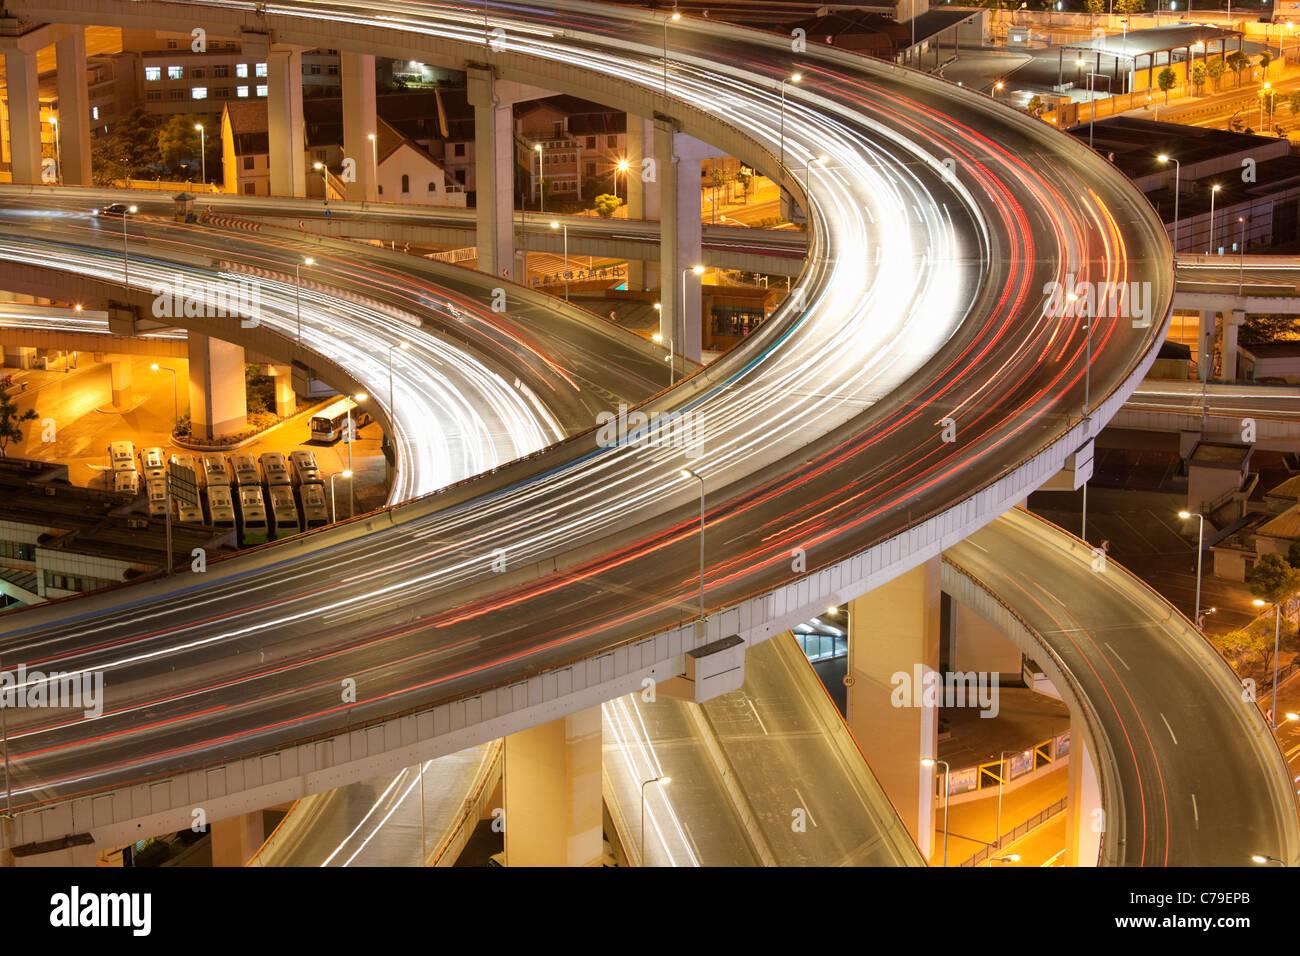 Il traffico sul Ponte di Nanpu rotonda al crepuscolo; Dongjiadu: Shanghai, Cina Immagini Stock